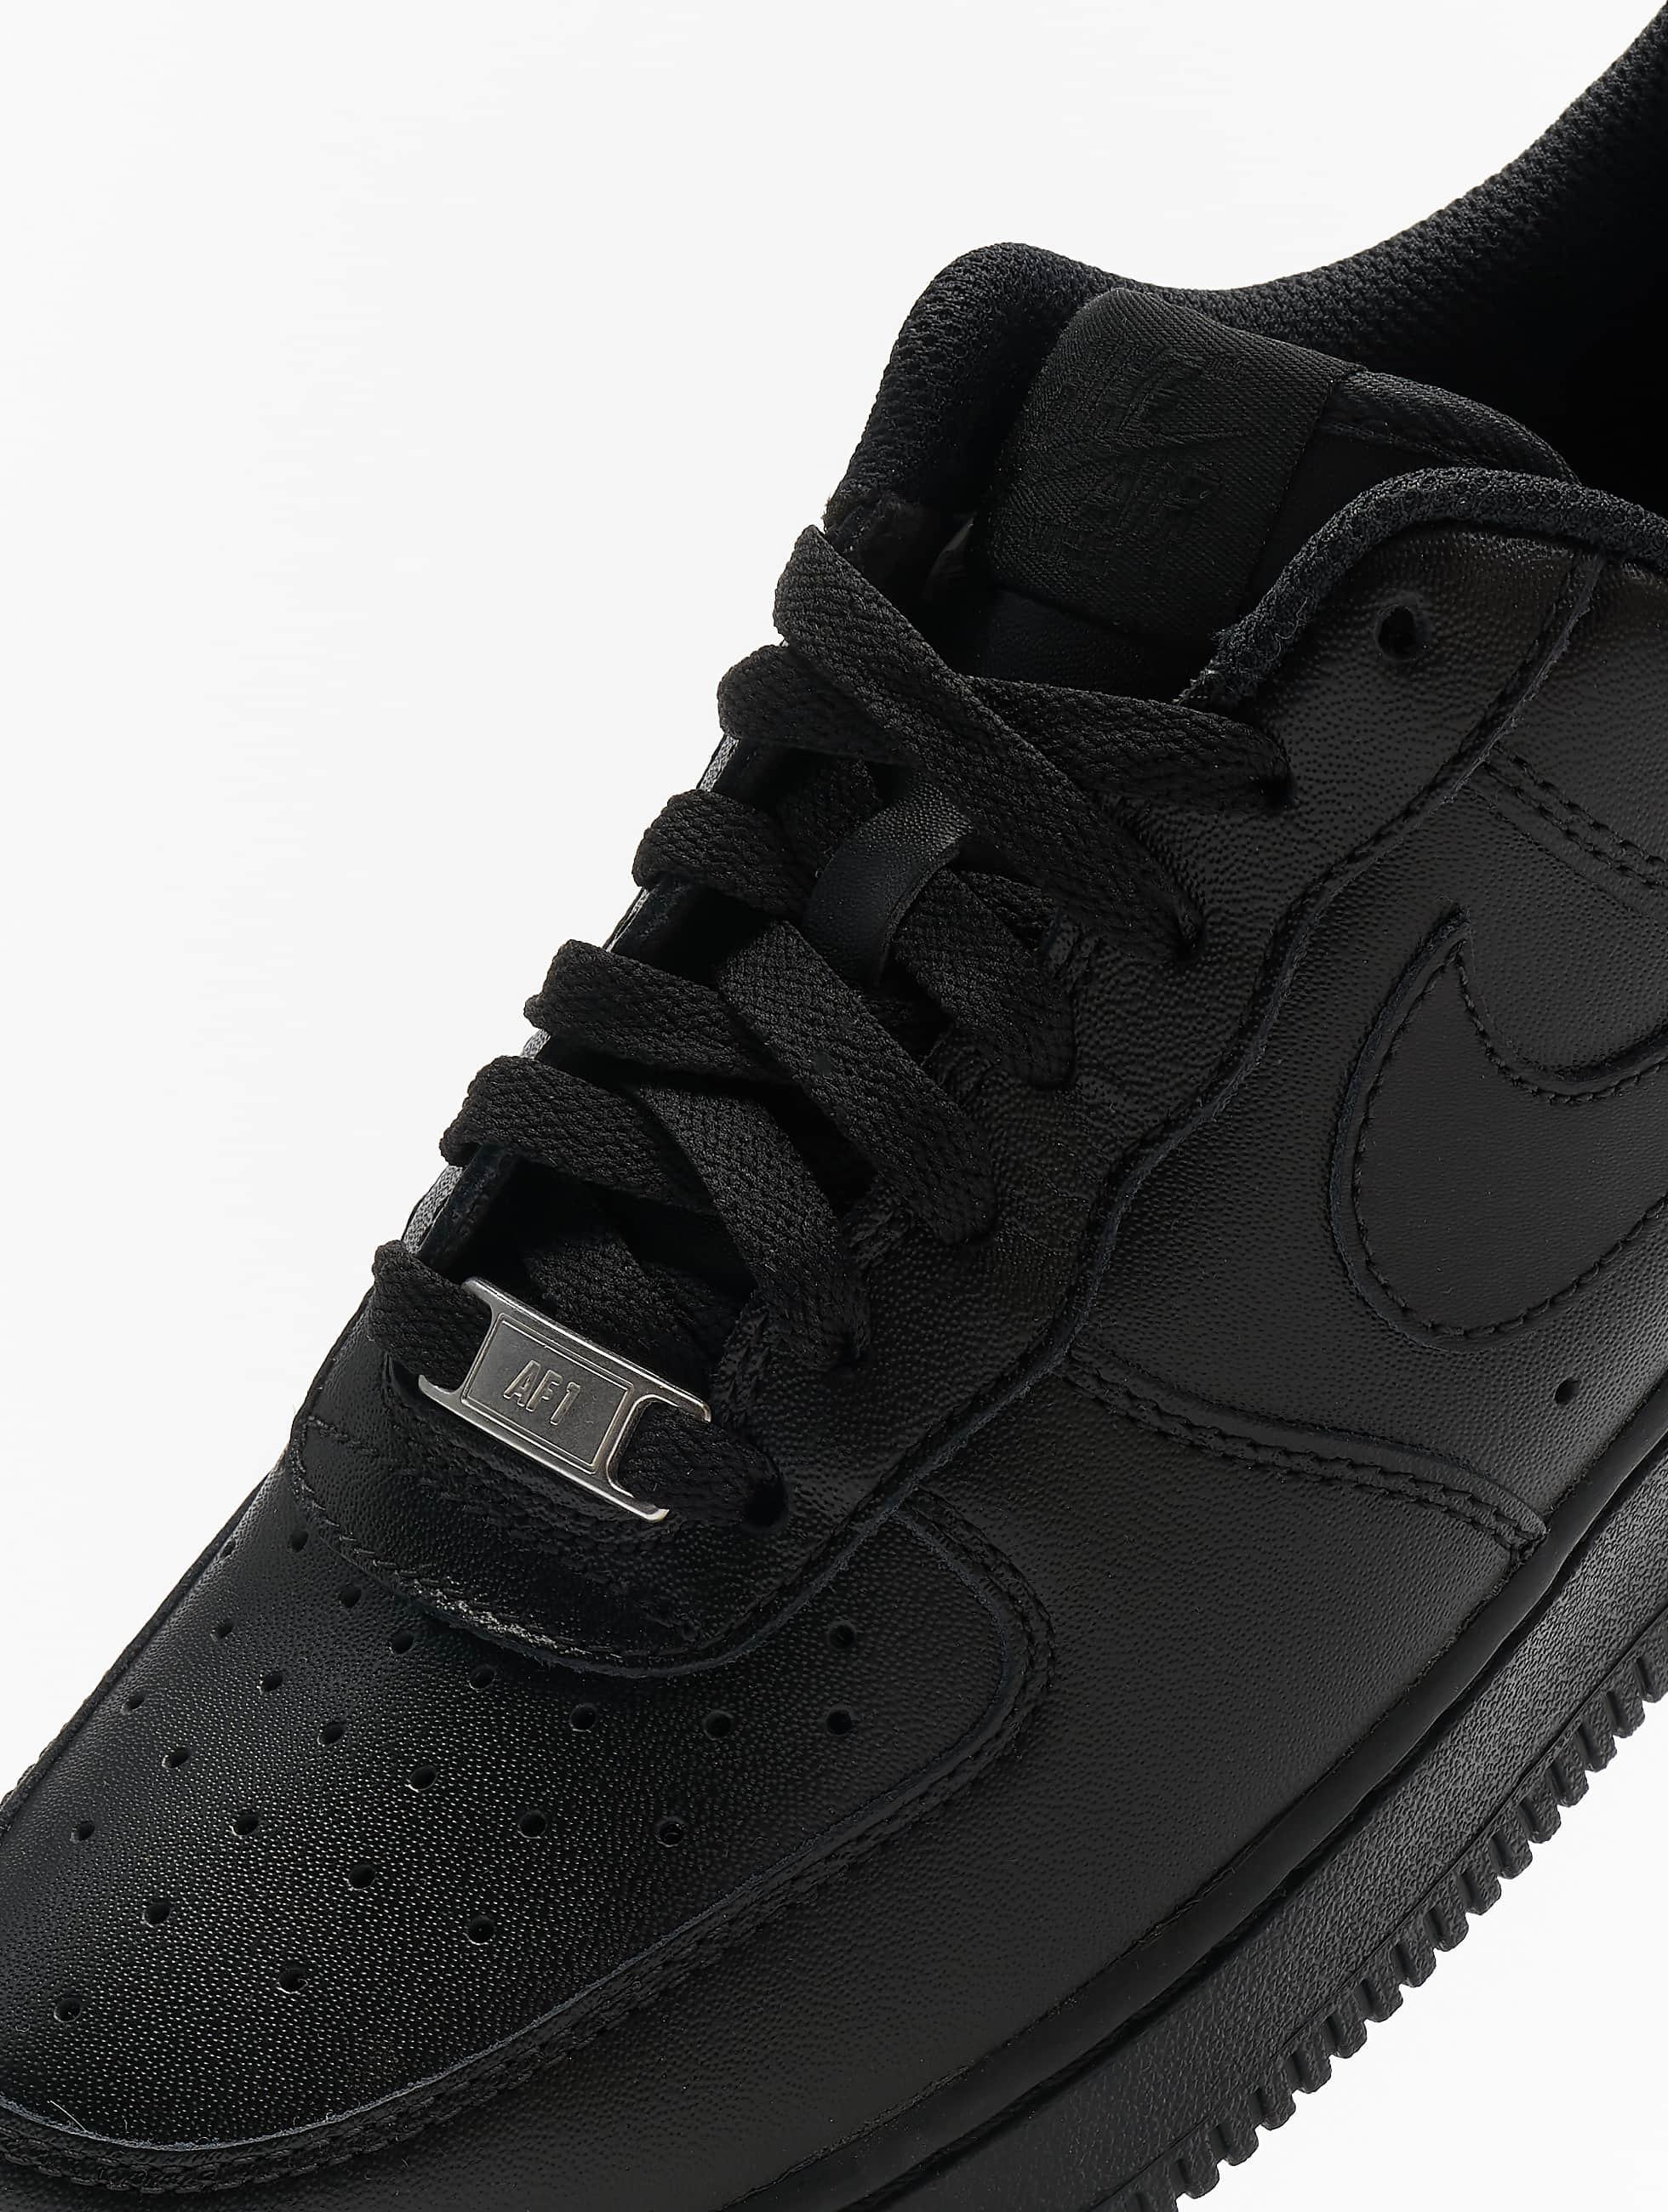 Nike Baskets Air Force 1 '07 Basketball Shoes noir